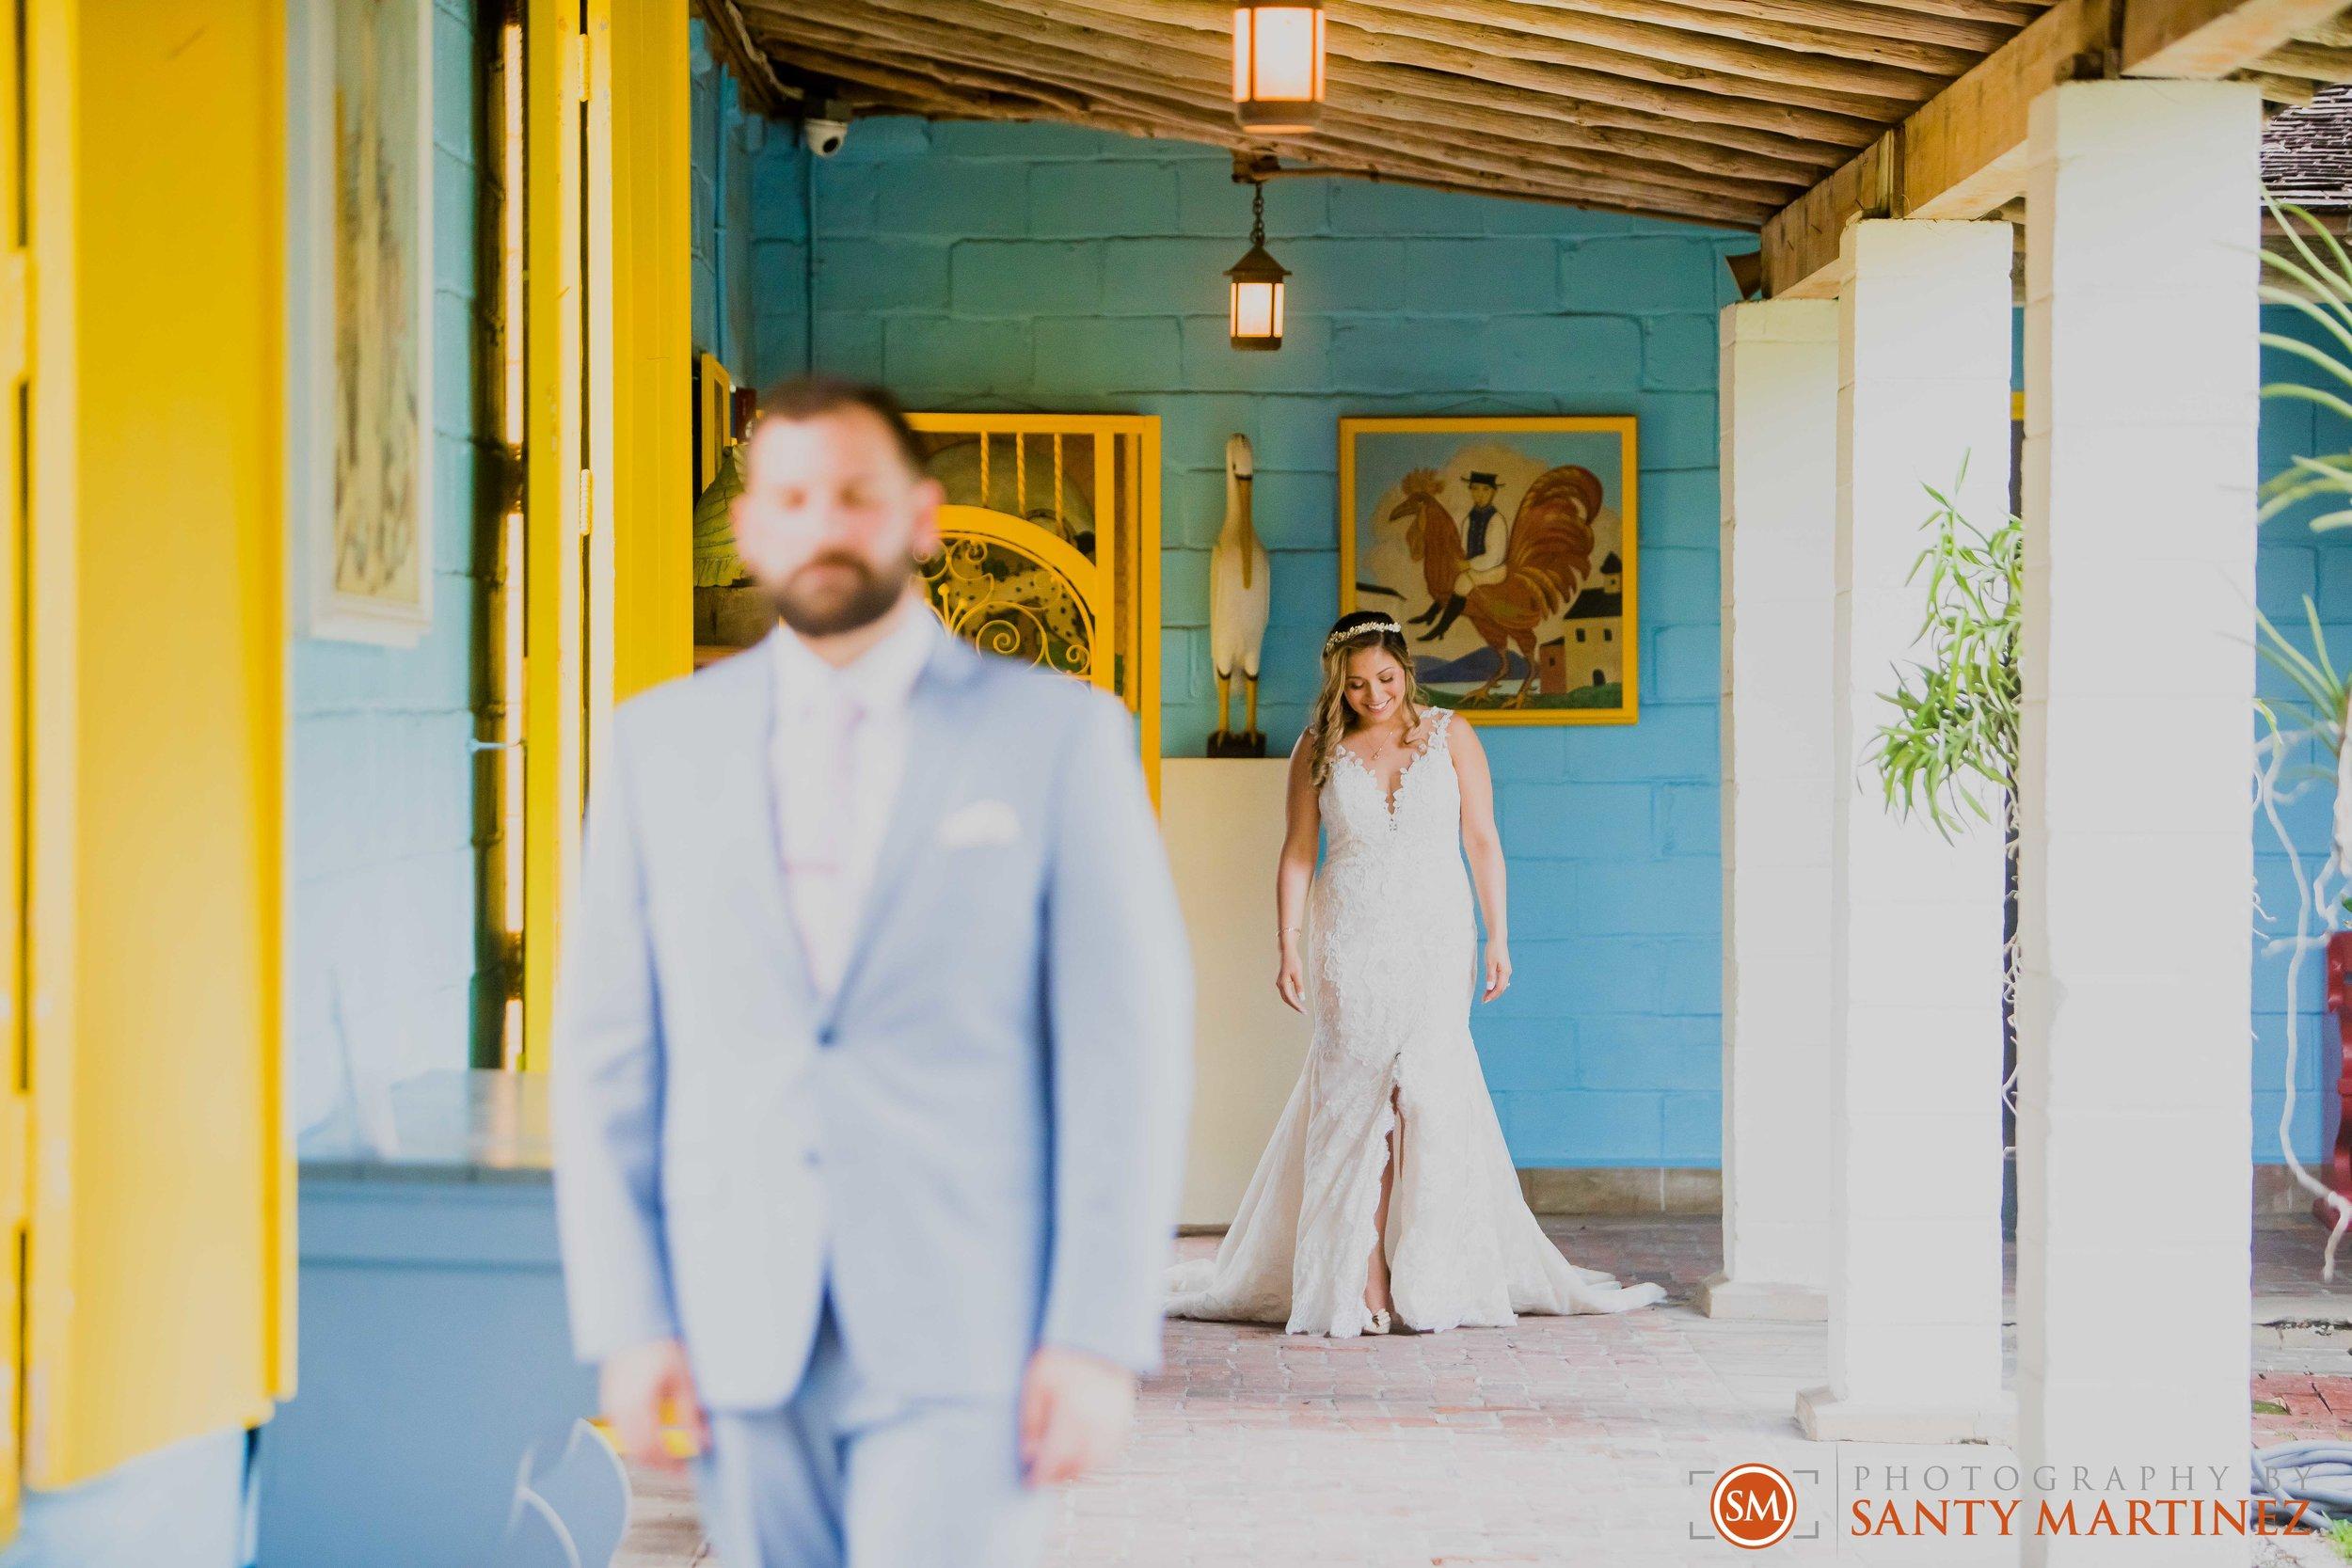 Wedding Bonnet House - Santy Martinez Photography-15.jpg